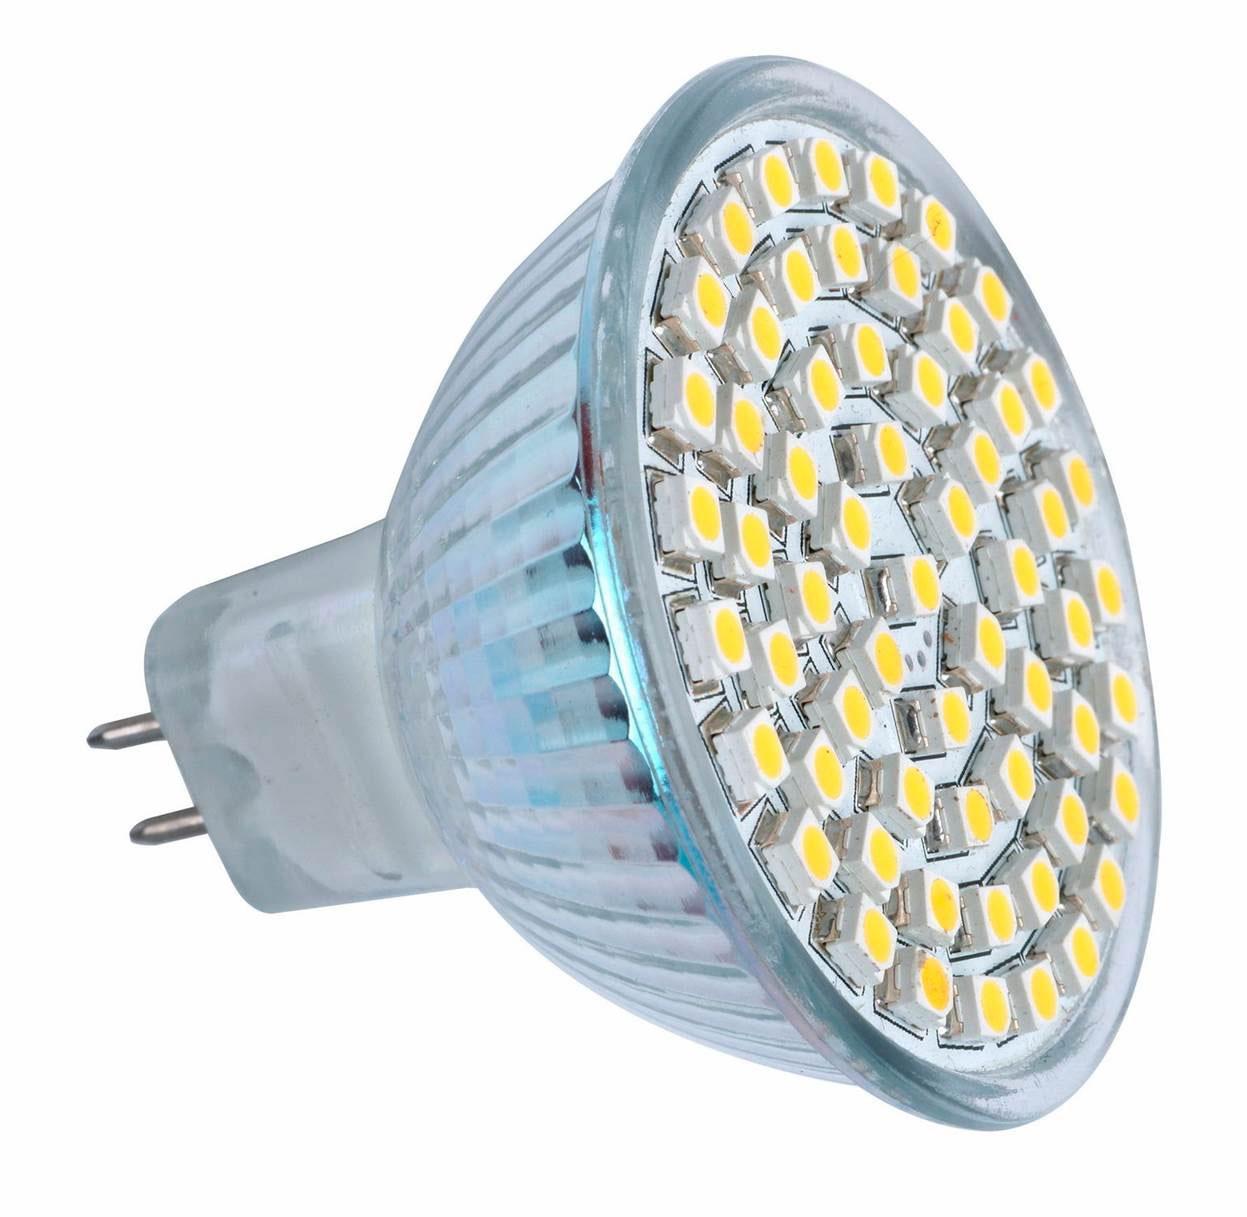 Eco Friendly LED Lighting